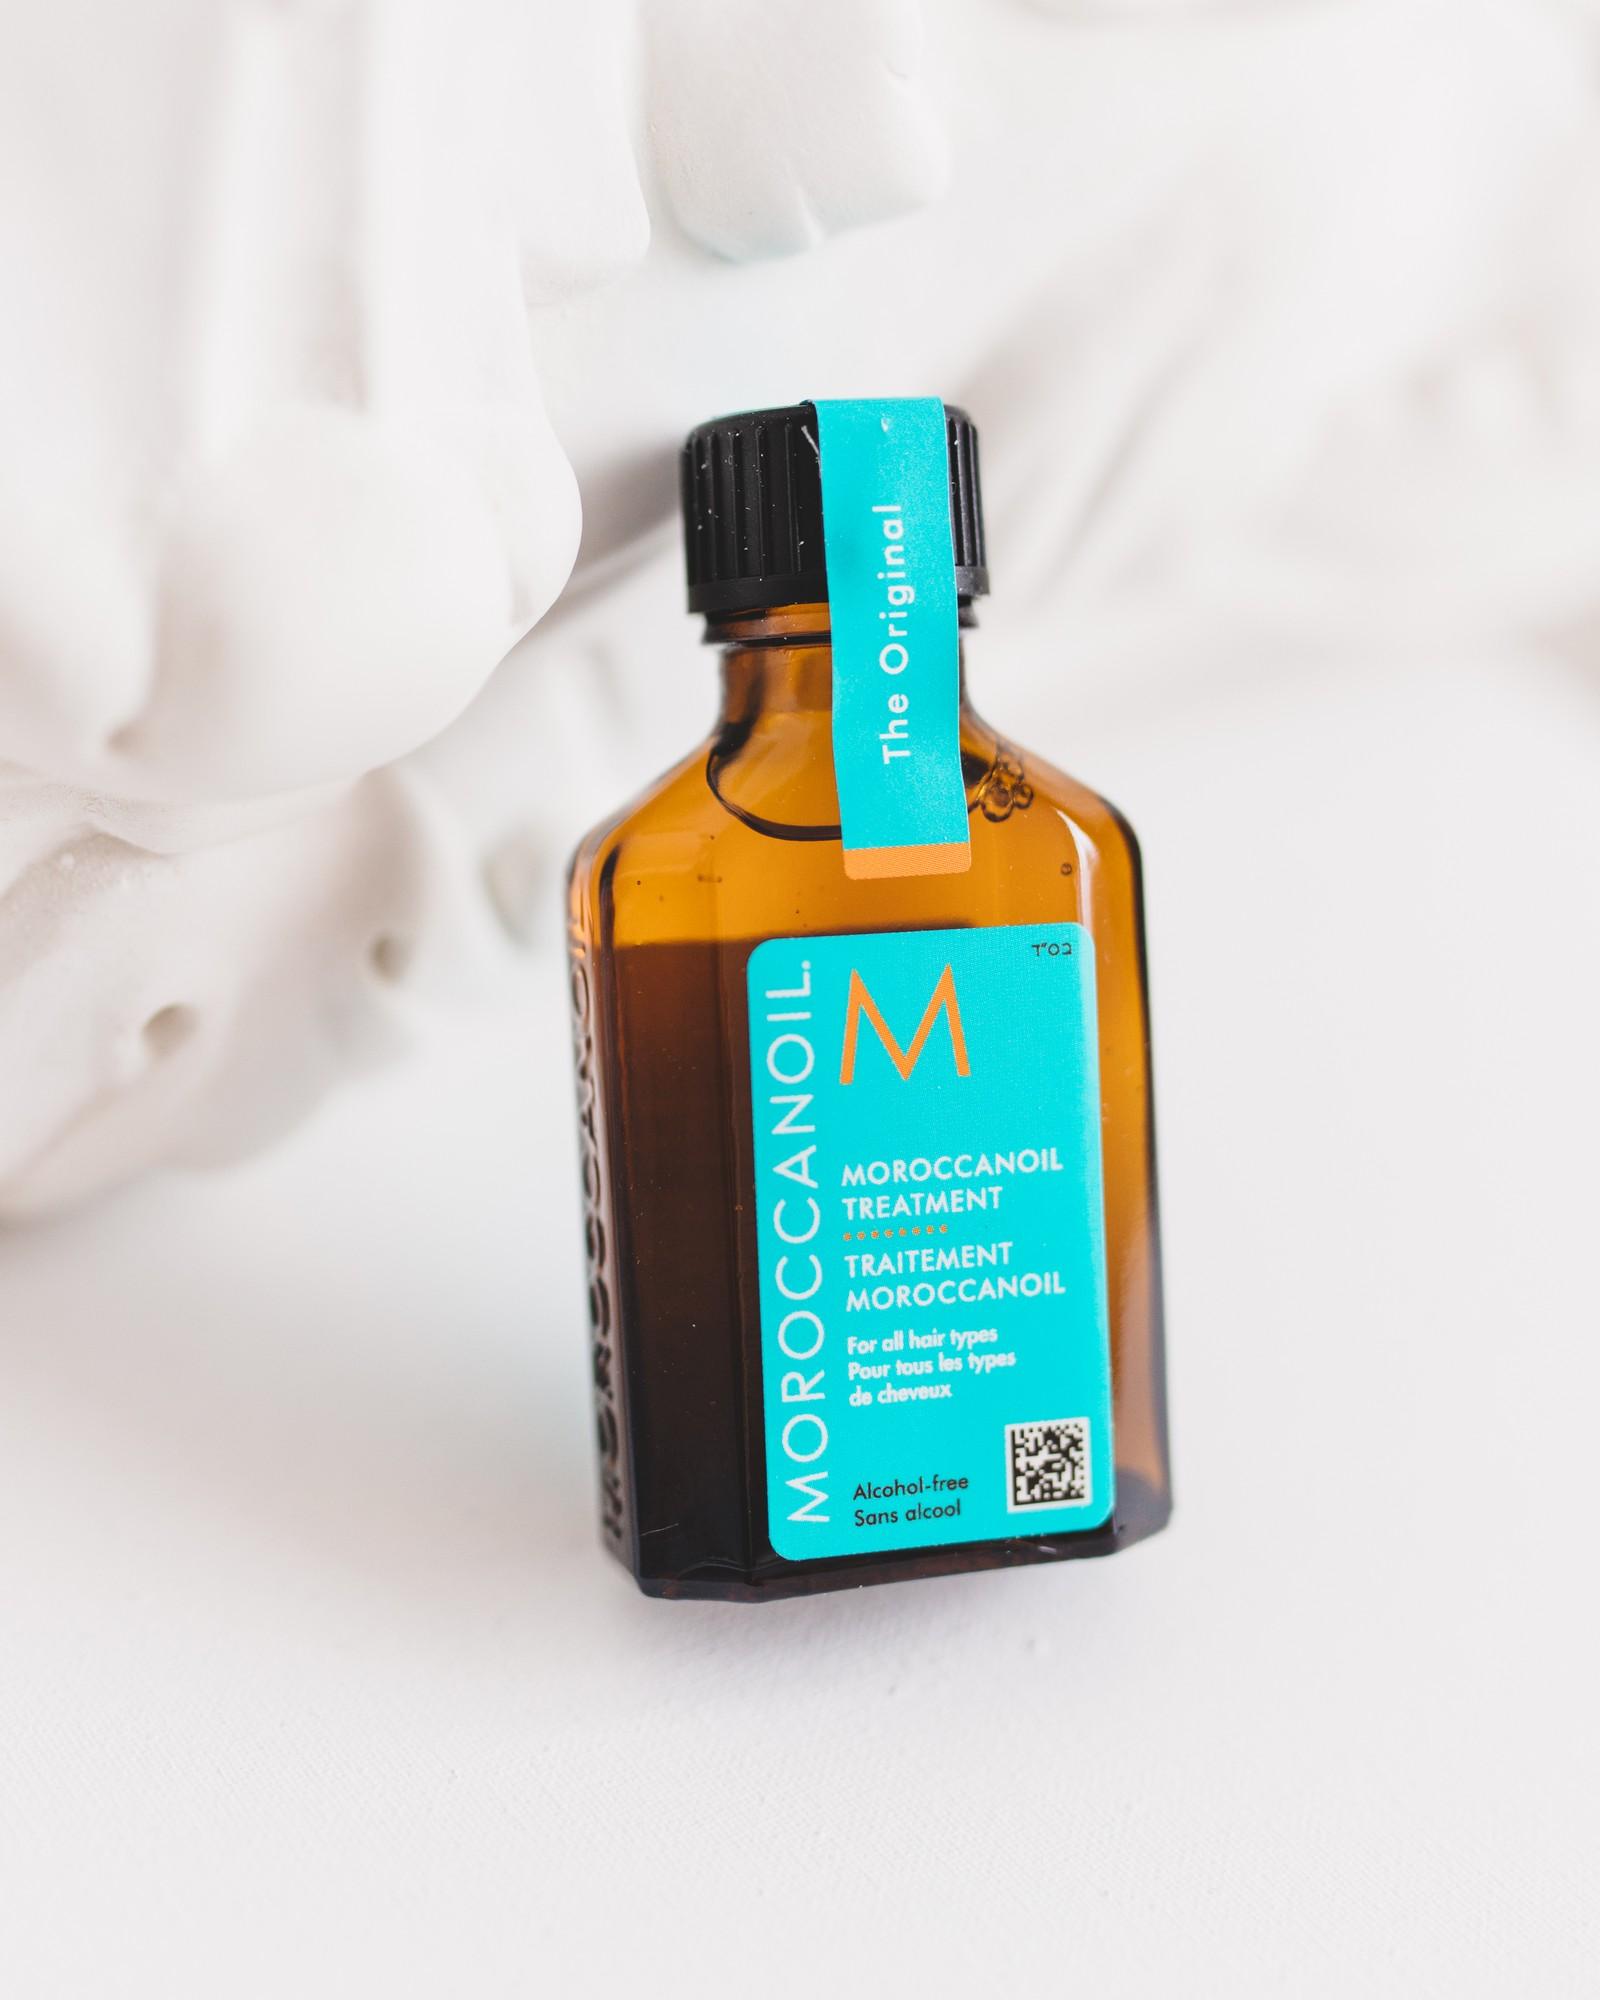 Moroccanoil Treatment Mini 25 ml